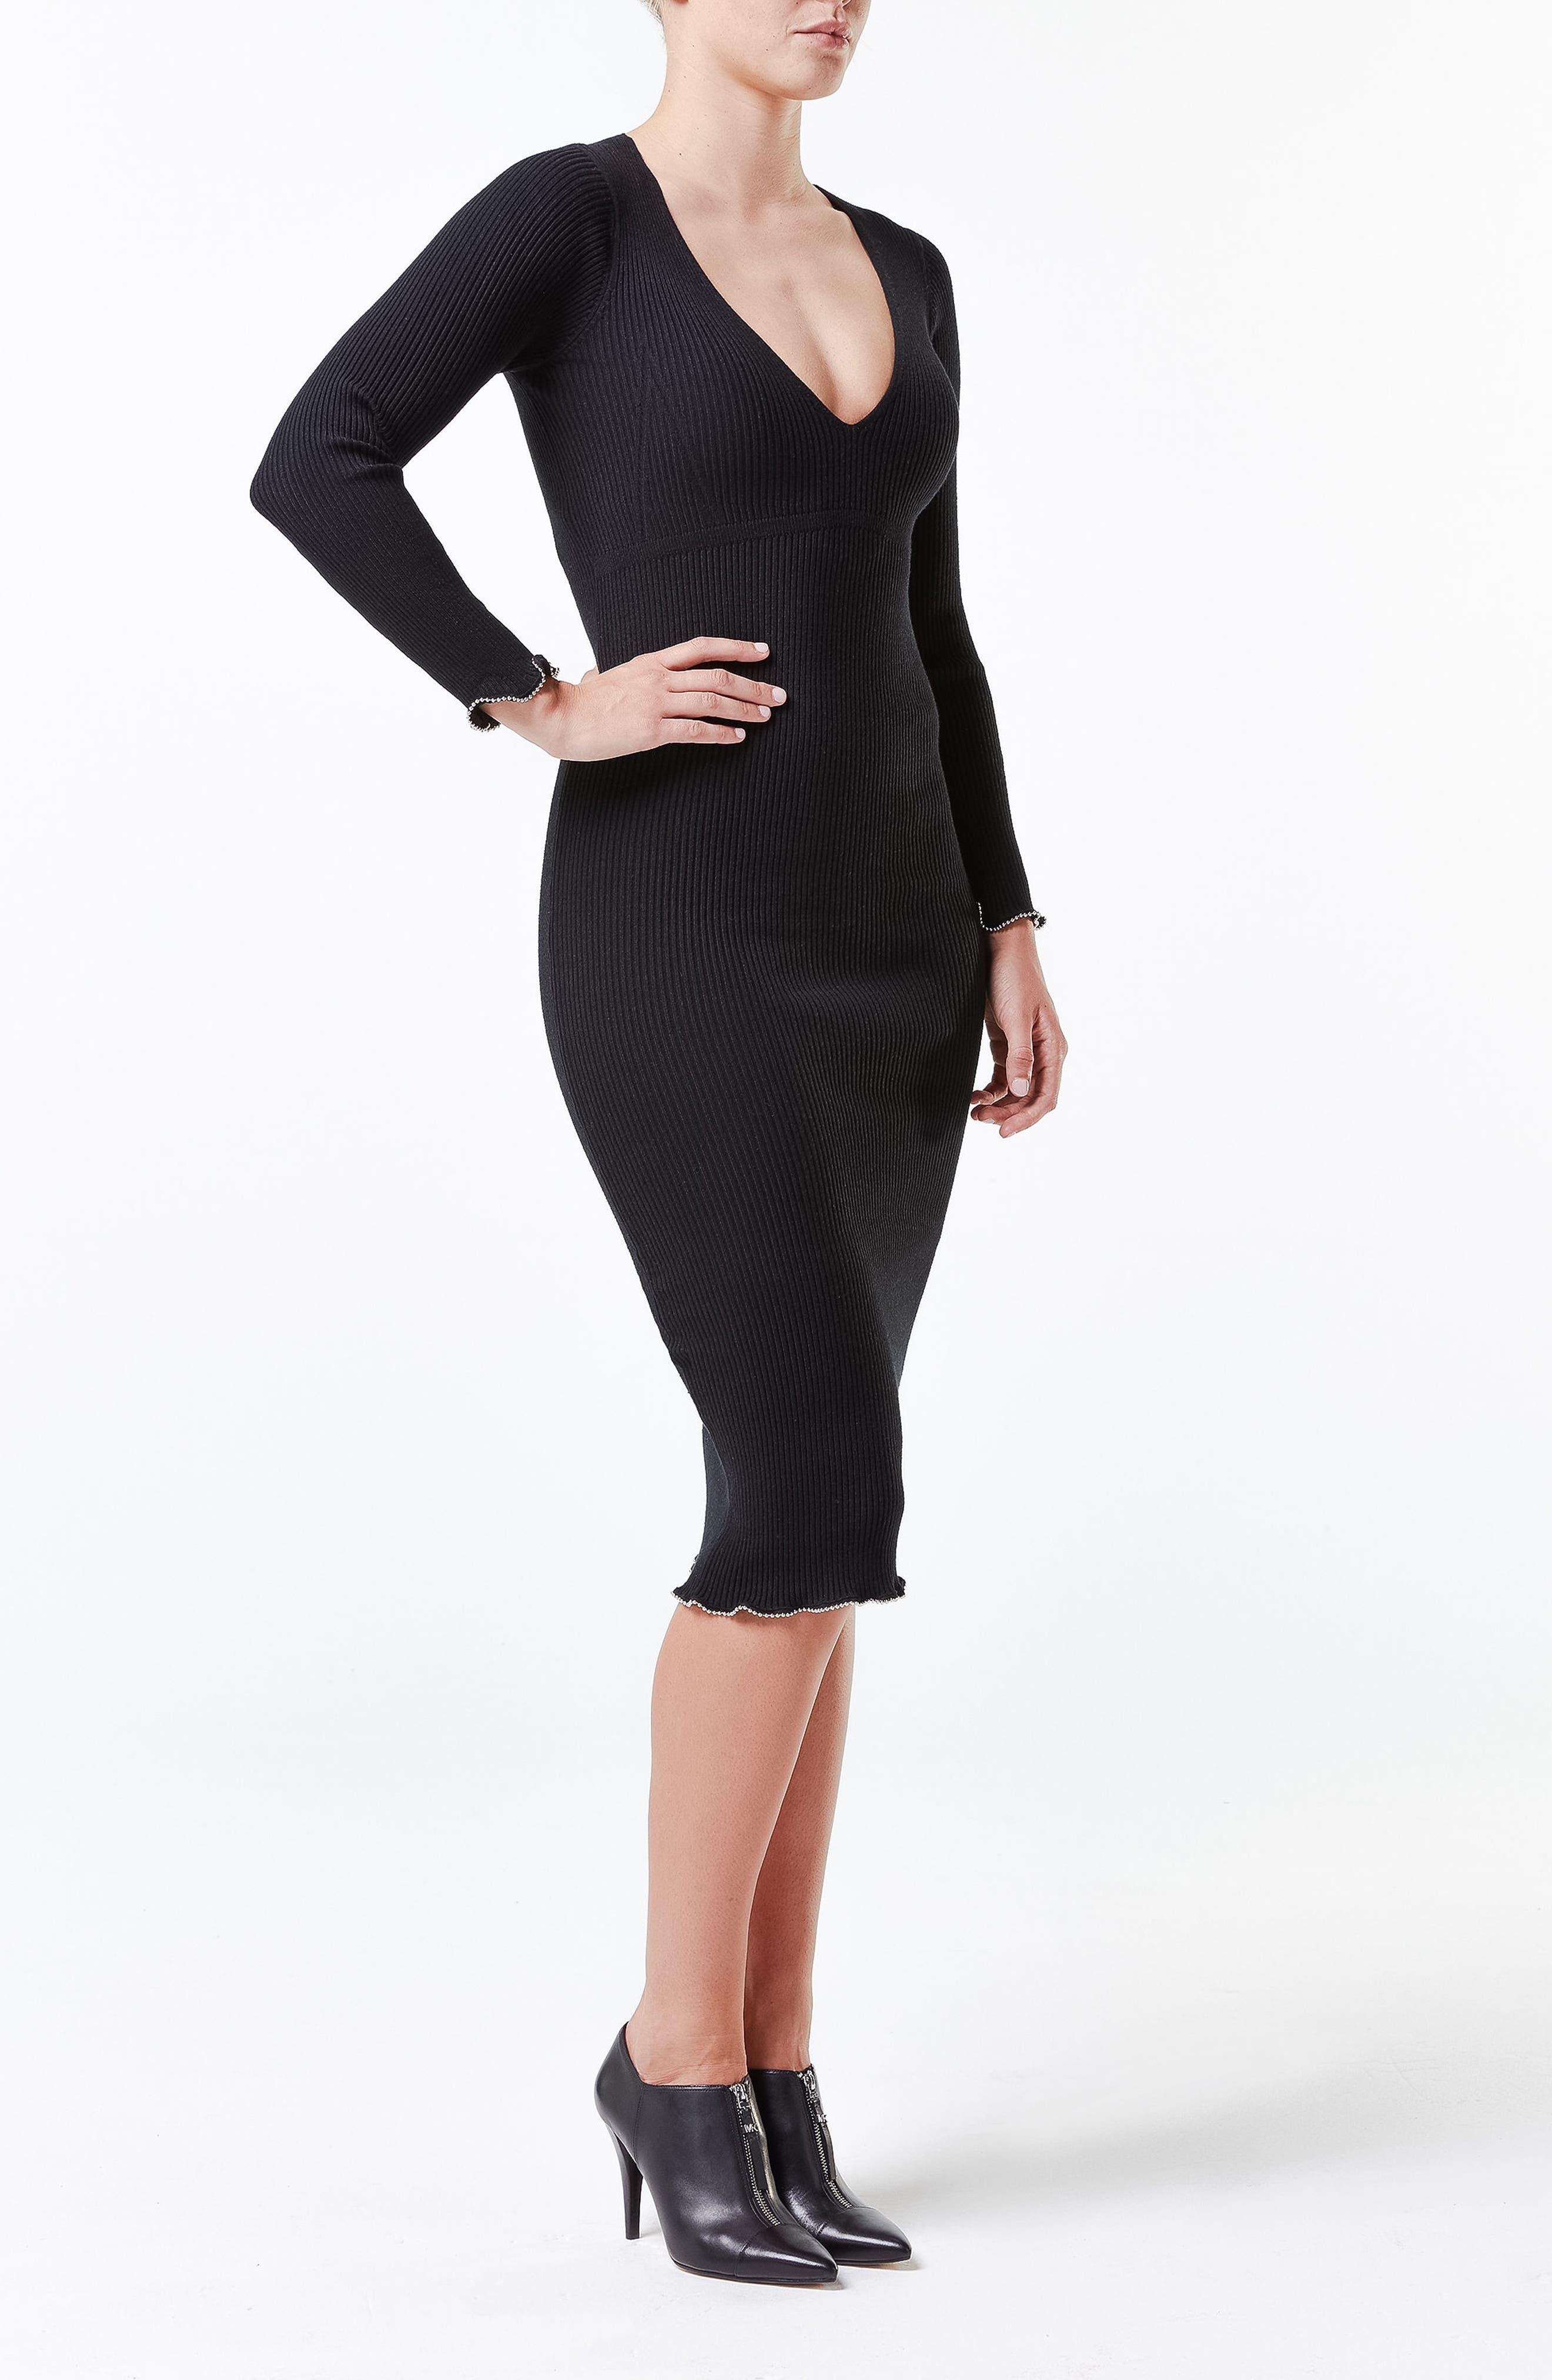 Suit Your Fancy Plunge Low-Back Mid-Thigh Bodysuit,                             Alternate thumbnail 9, color,                             VERY BLACK